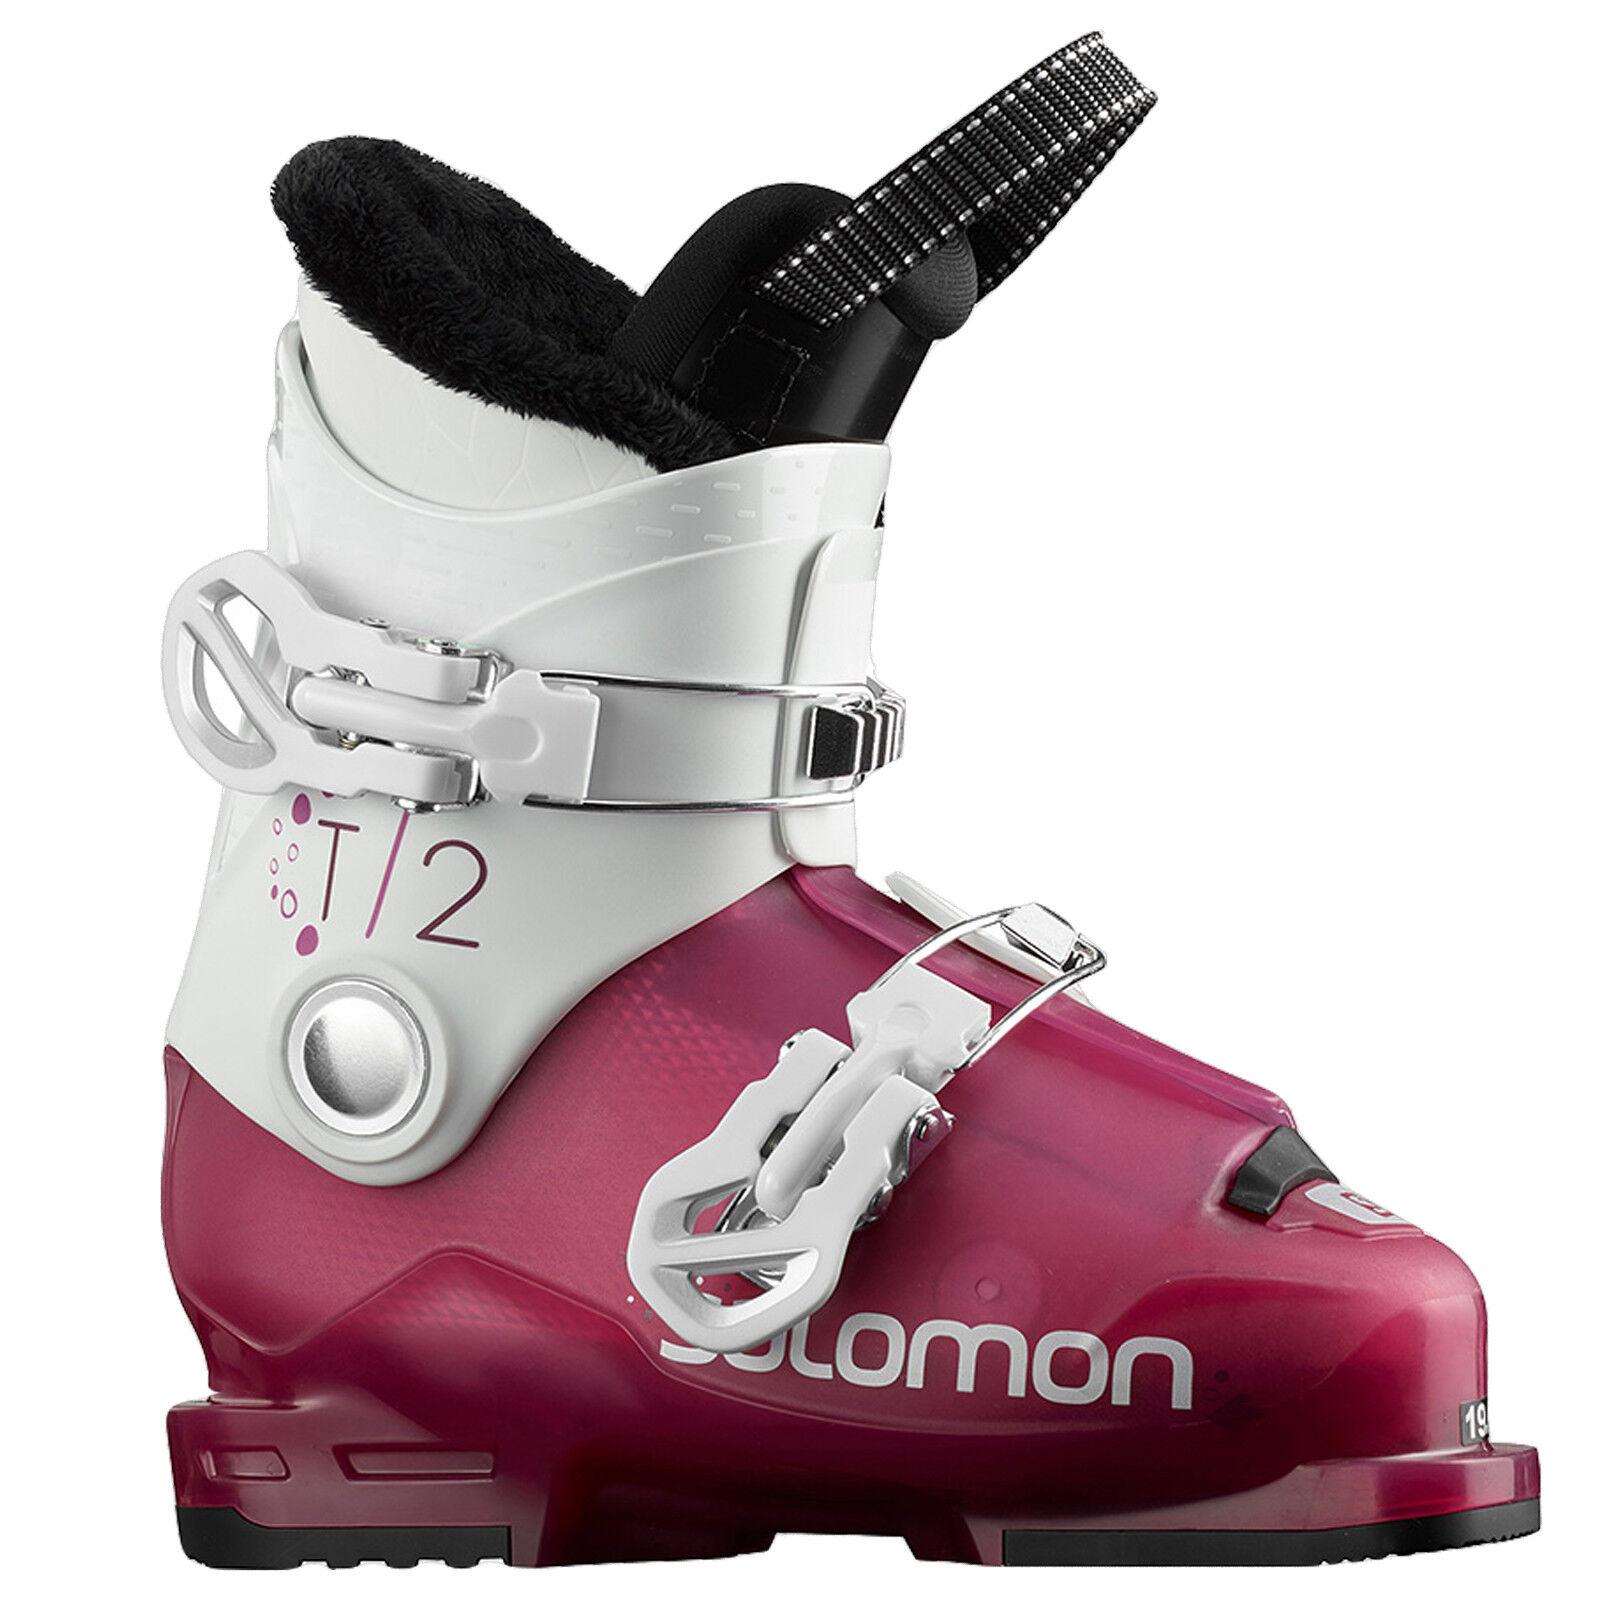 2019 Enfants Ski Bottes Chaussures Bateau Salomon Salomon Salomon T2 Rt Girly ~ Taille Mp 18 = 95db99